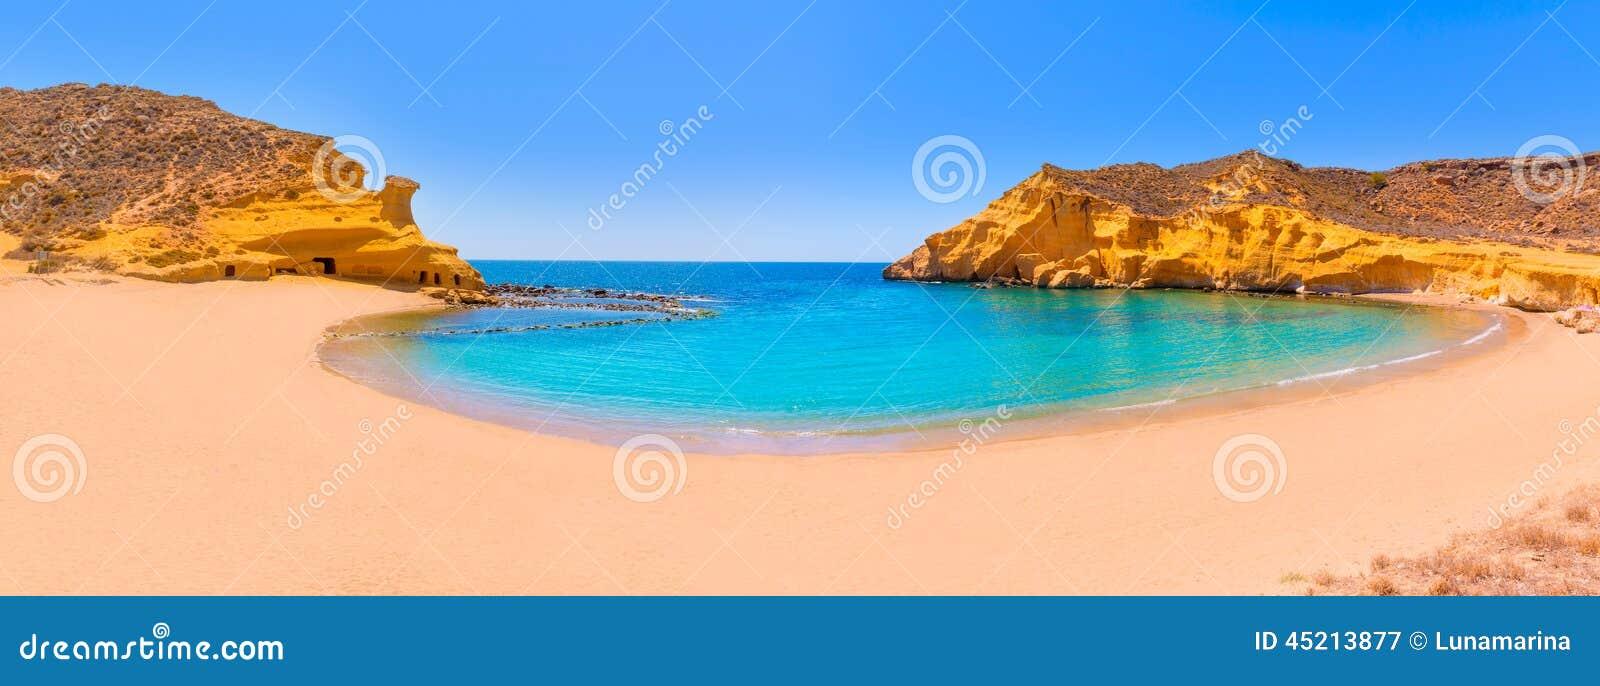 Aguilas Spain  city photos gallery : ... Beach In Murcia Near Aguilas Spain Stock Photo Image: 45213877